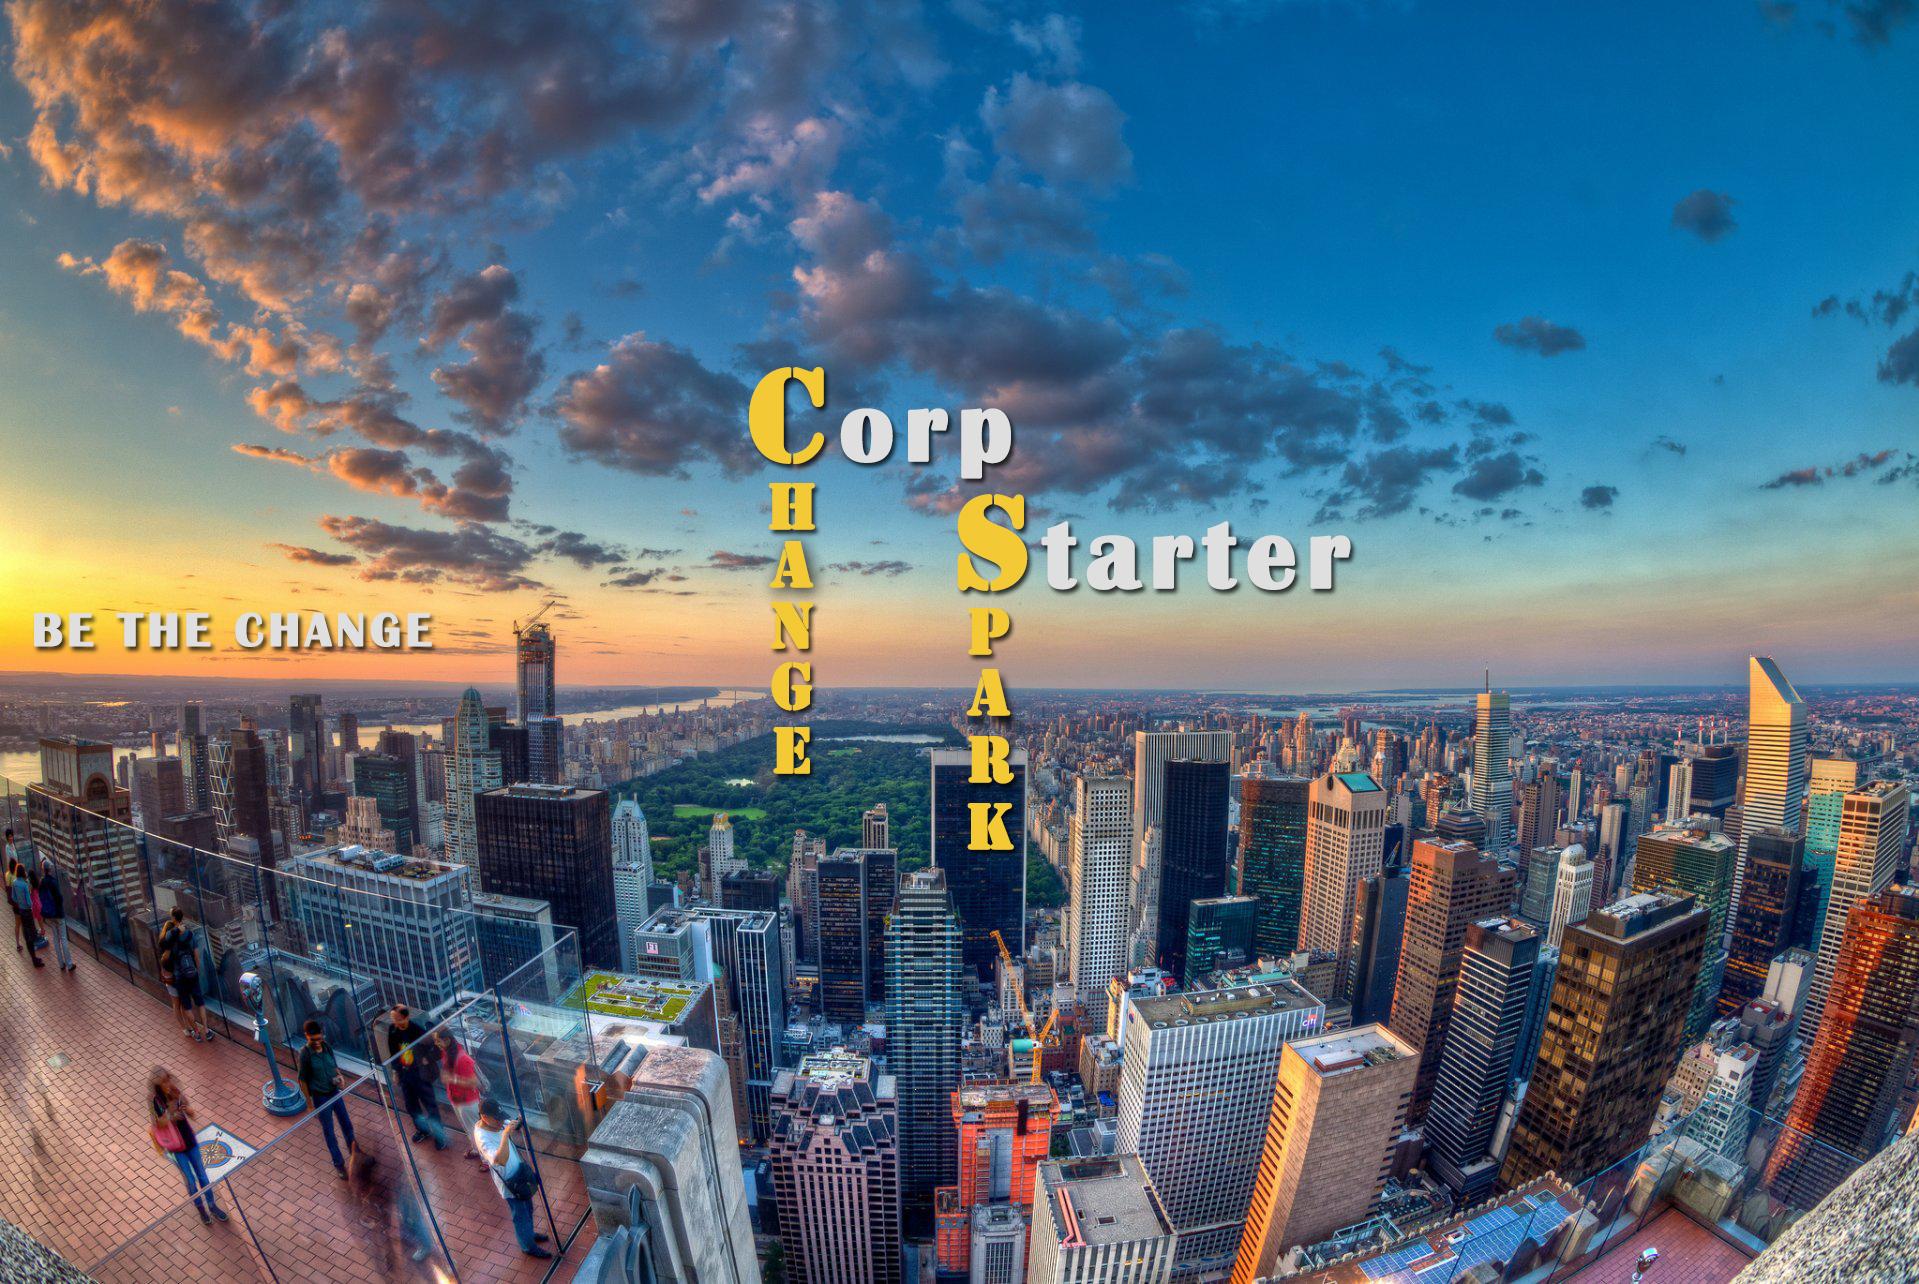 Corpstarter star show 2017 voltagebd Images